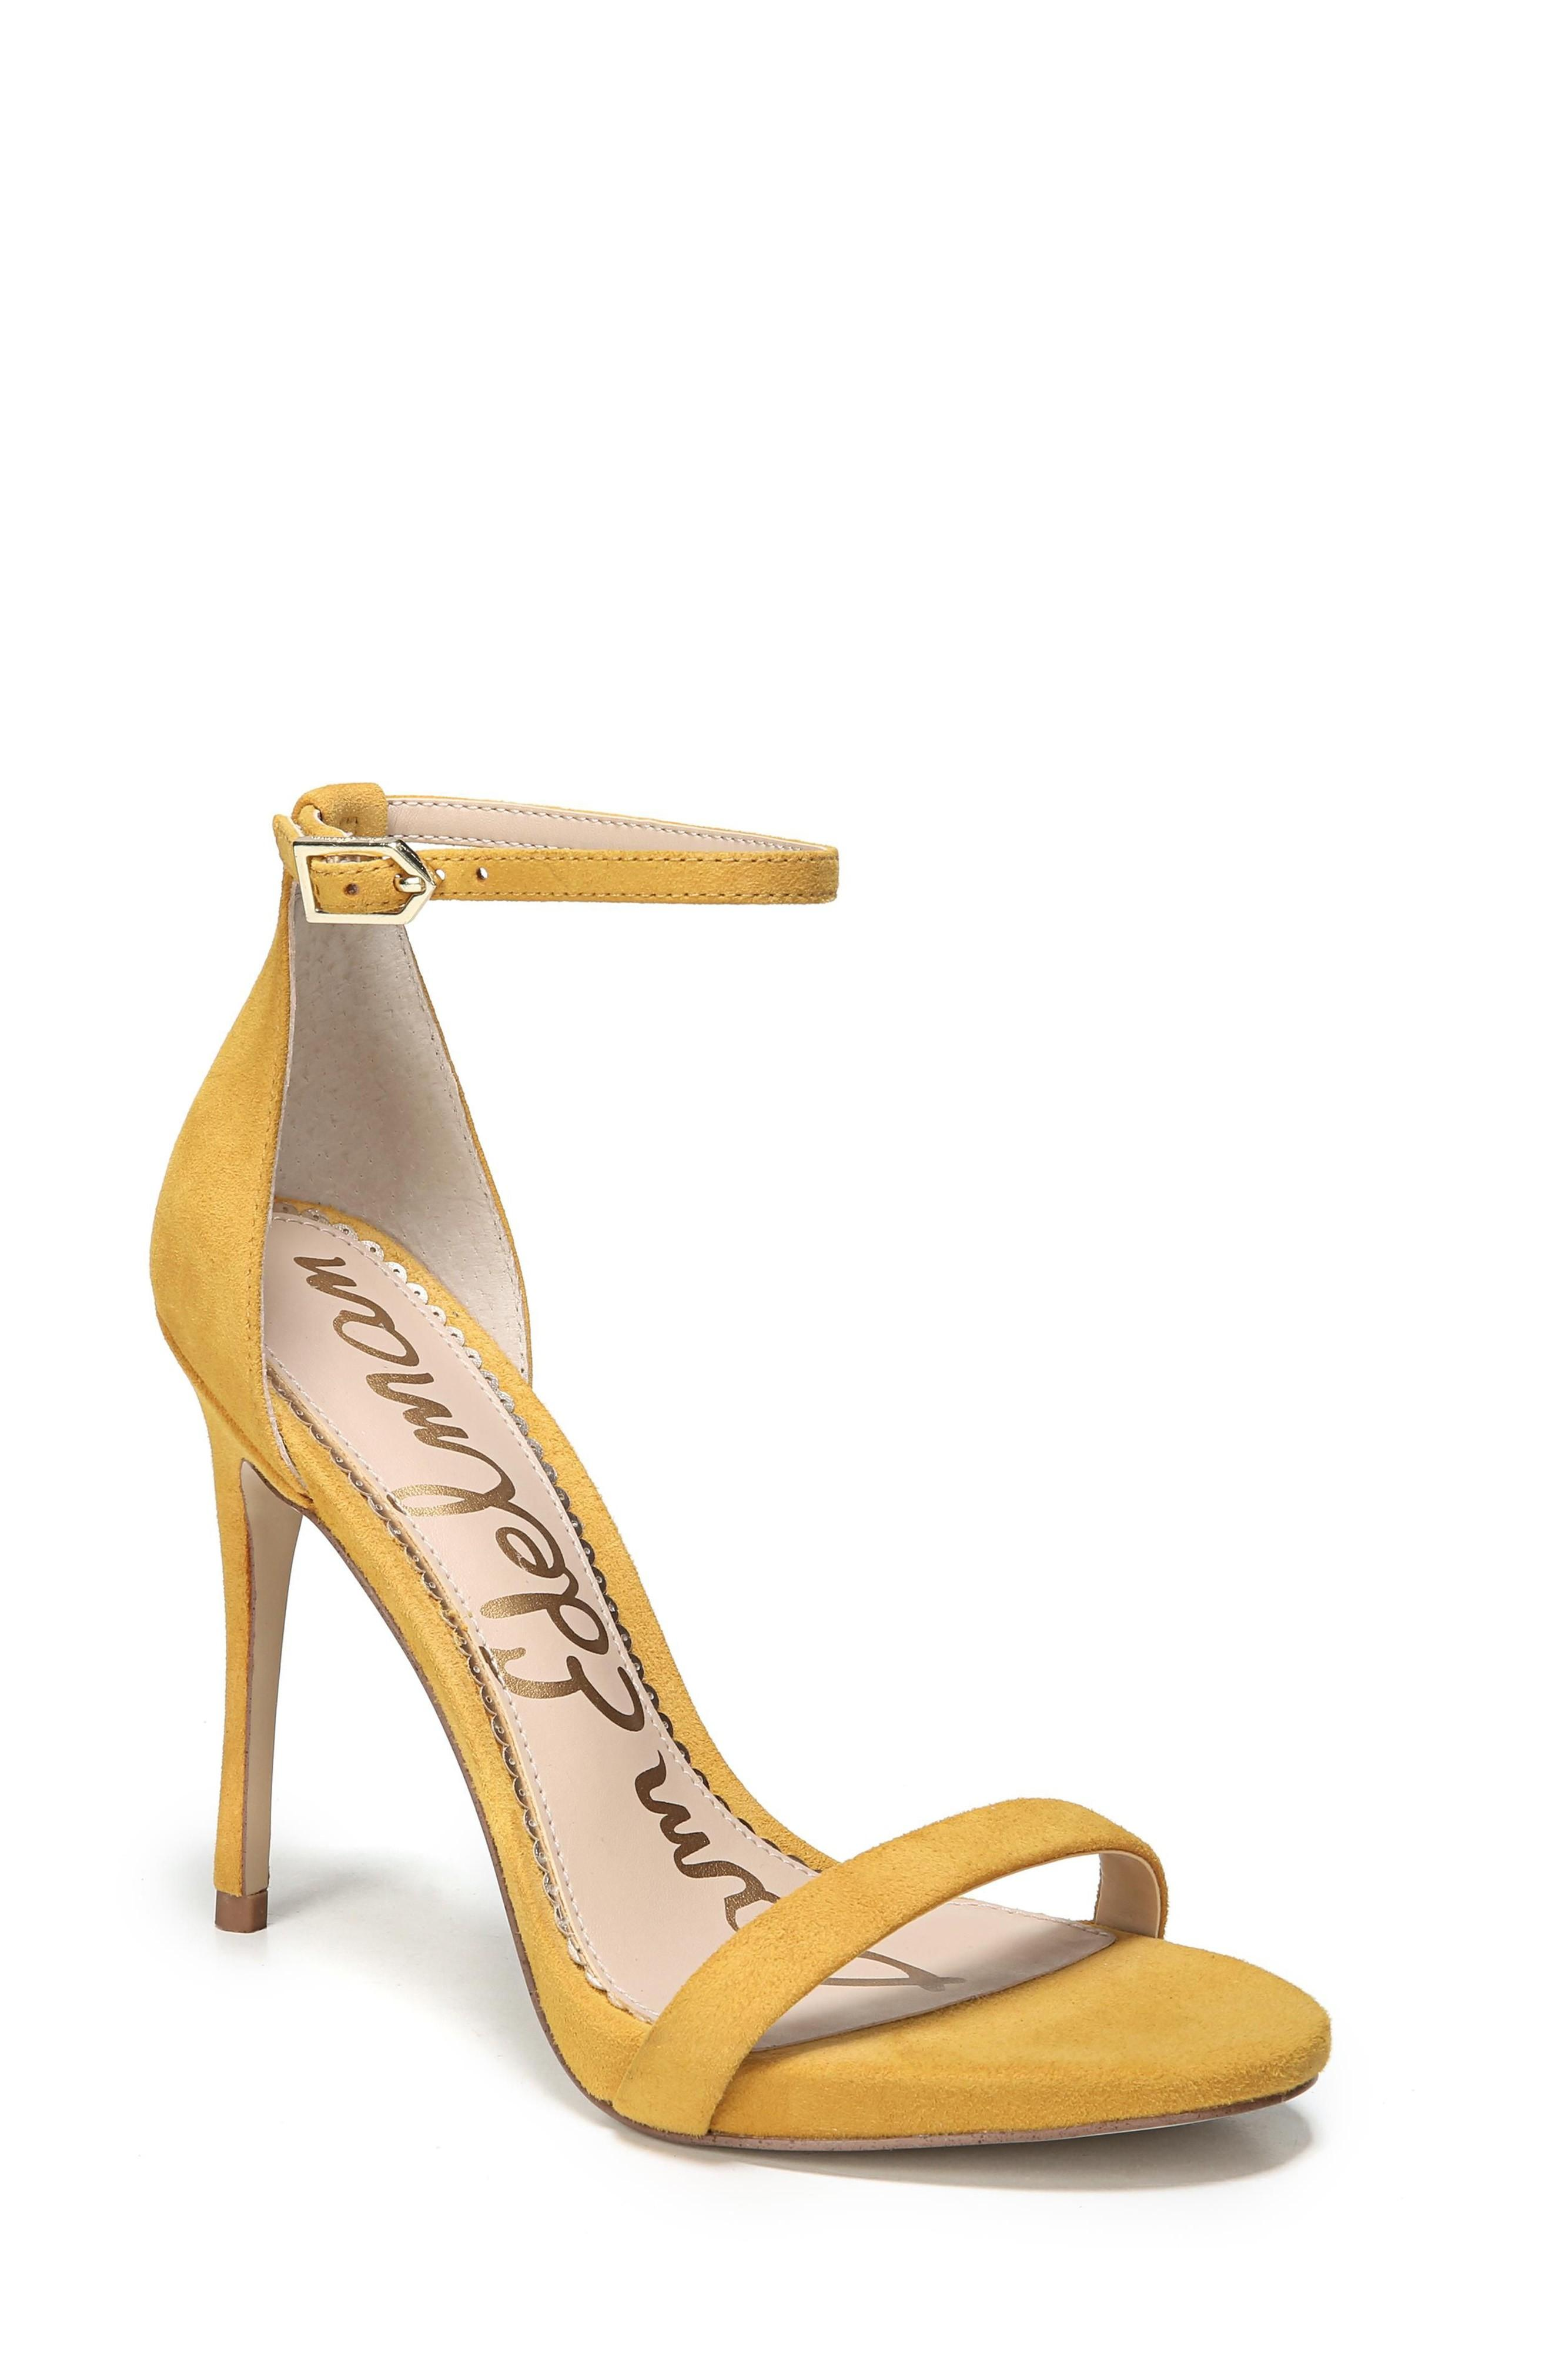 Sam Edelman Ariella Ankle Strap Sandal In Sunglow Yellow Suede